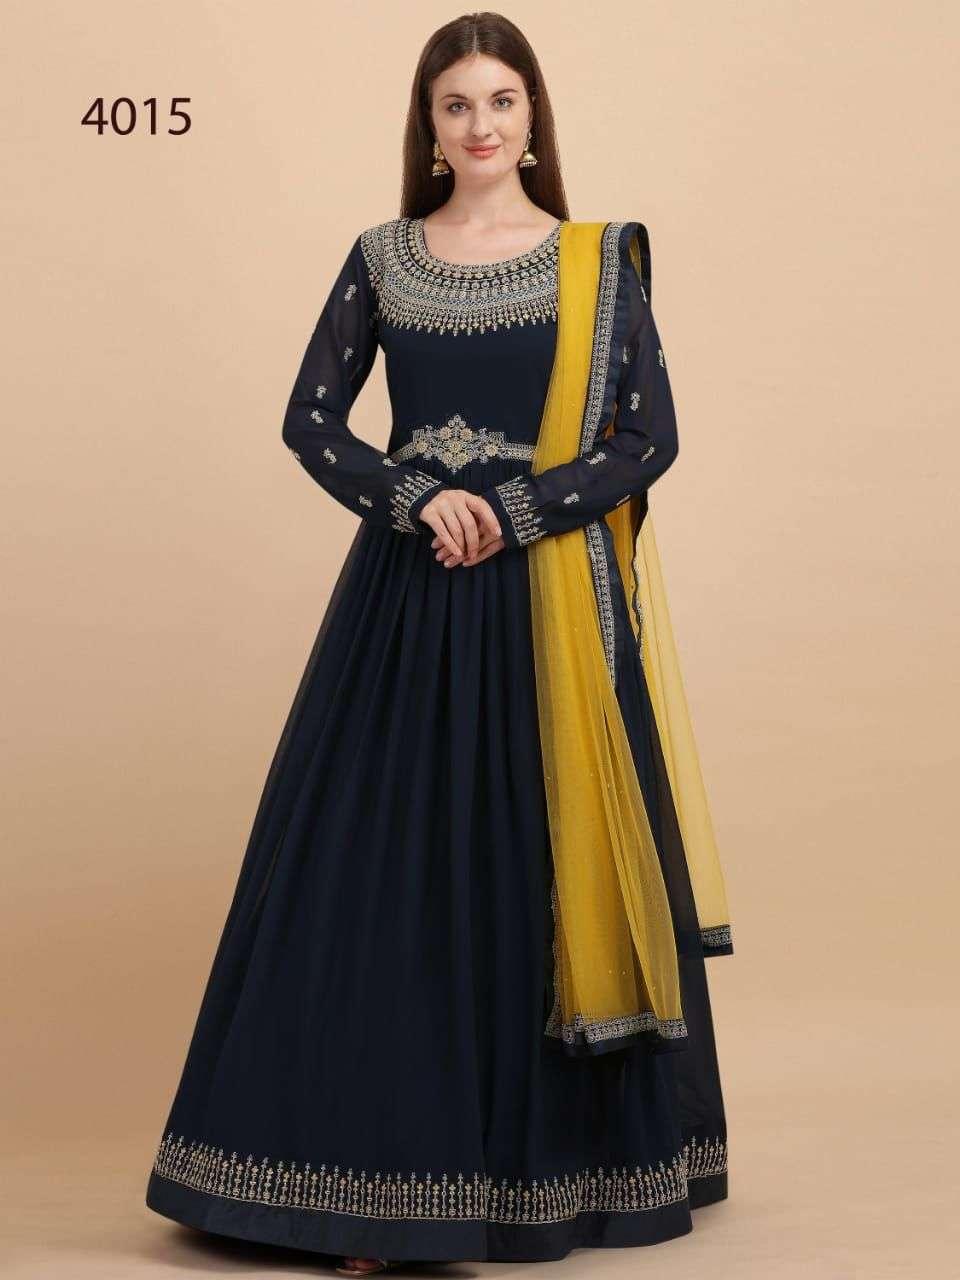 Avighaya 4015 Series Designer Party Wear Readymade Dress Catalog Wholesaler